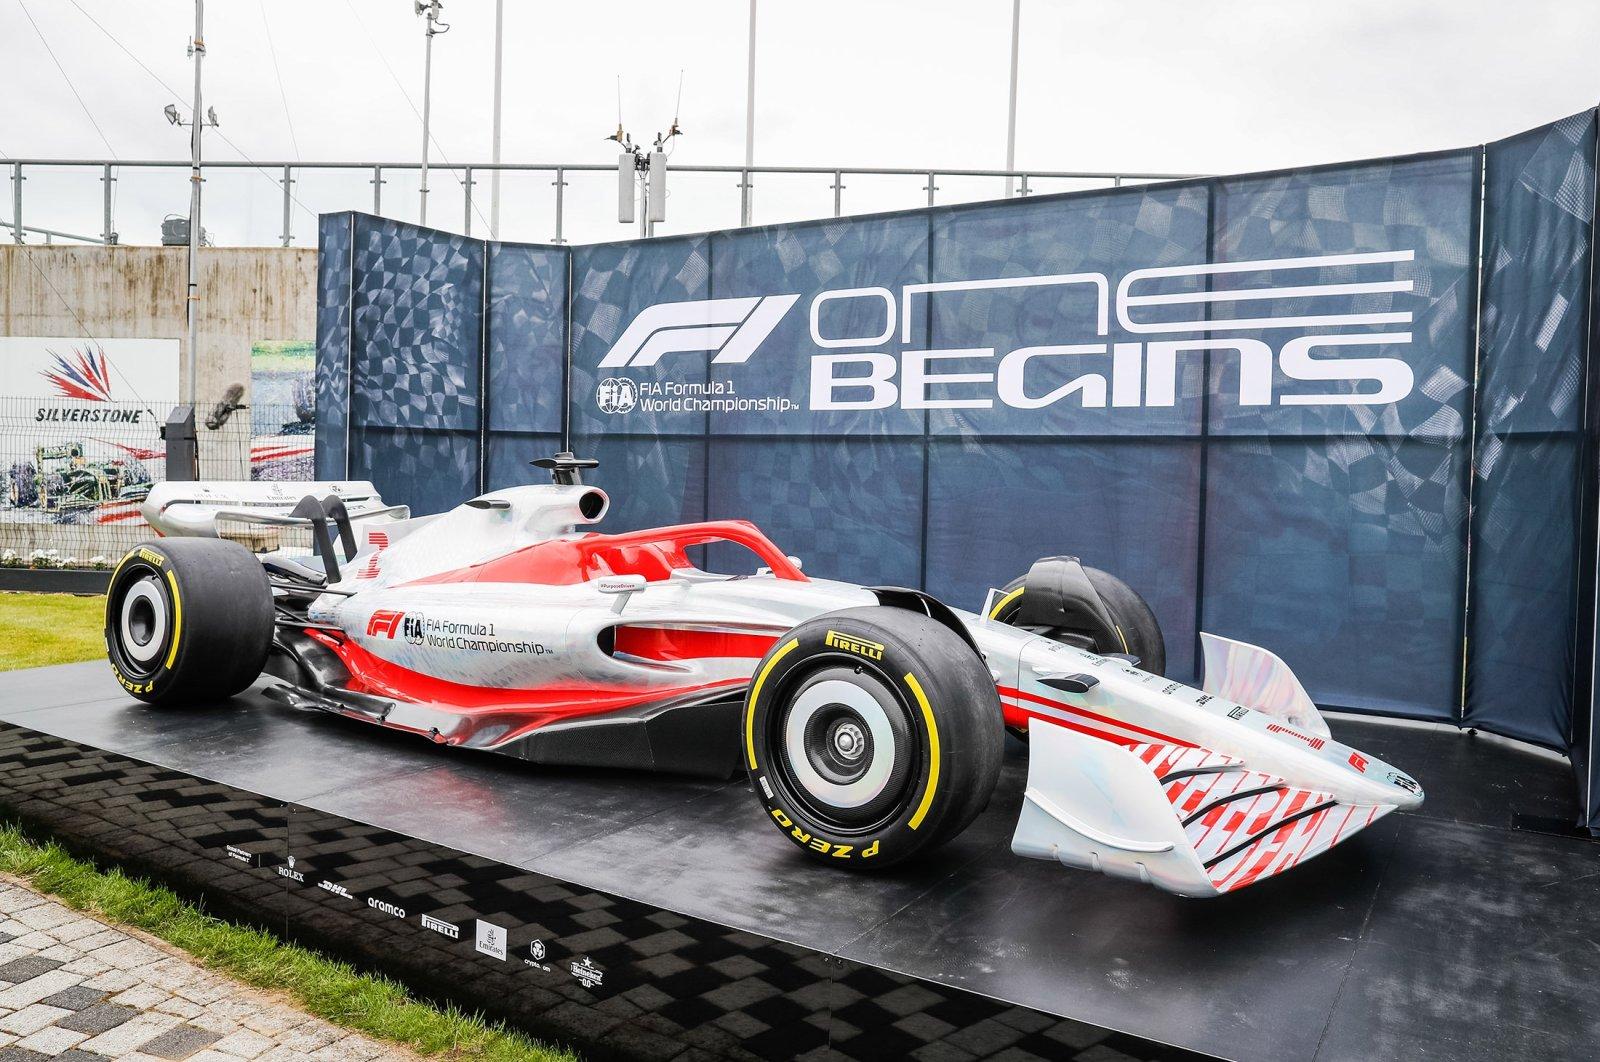 The 2022 concept car during the Formula 1 Pirelli British Grand Prix 2021 at the Silverstone Circuit, in Silverstone, United Kingdom, July 16, 2021.